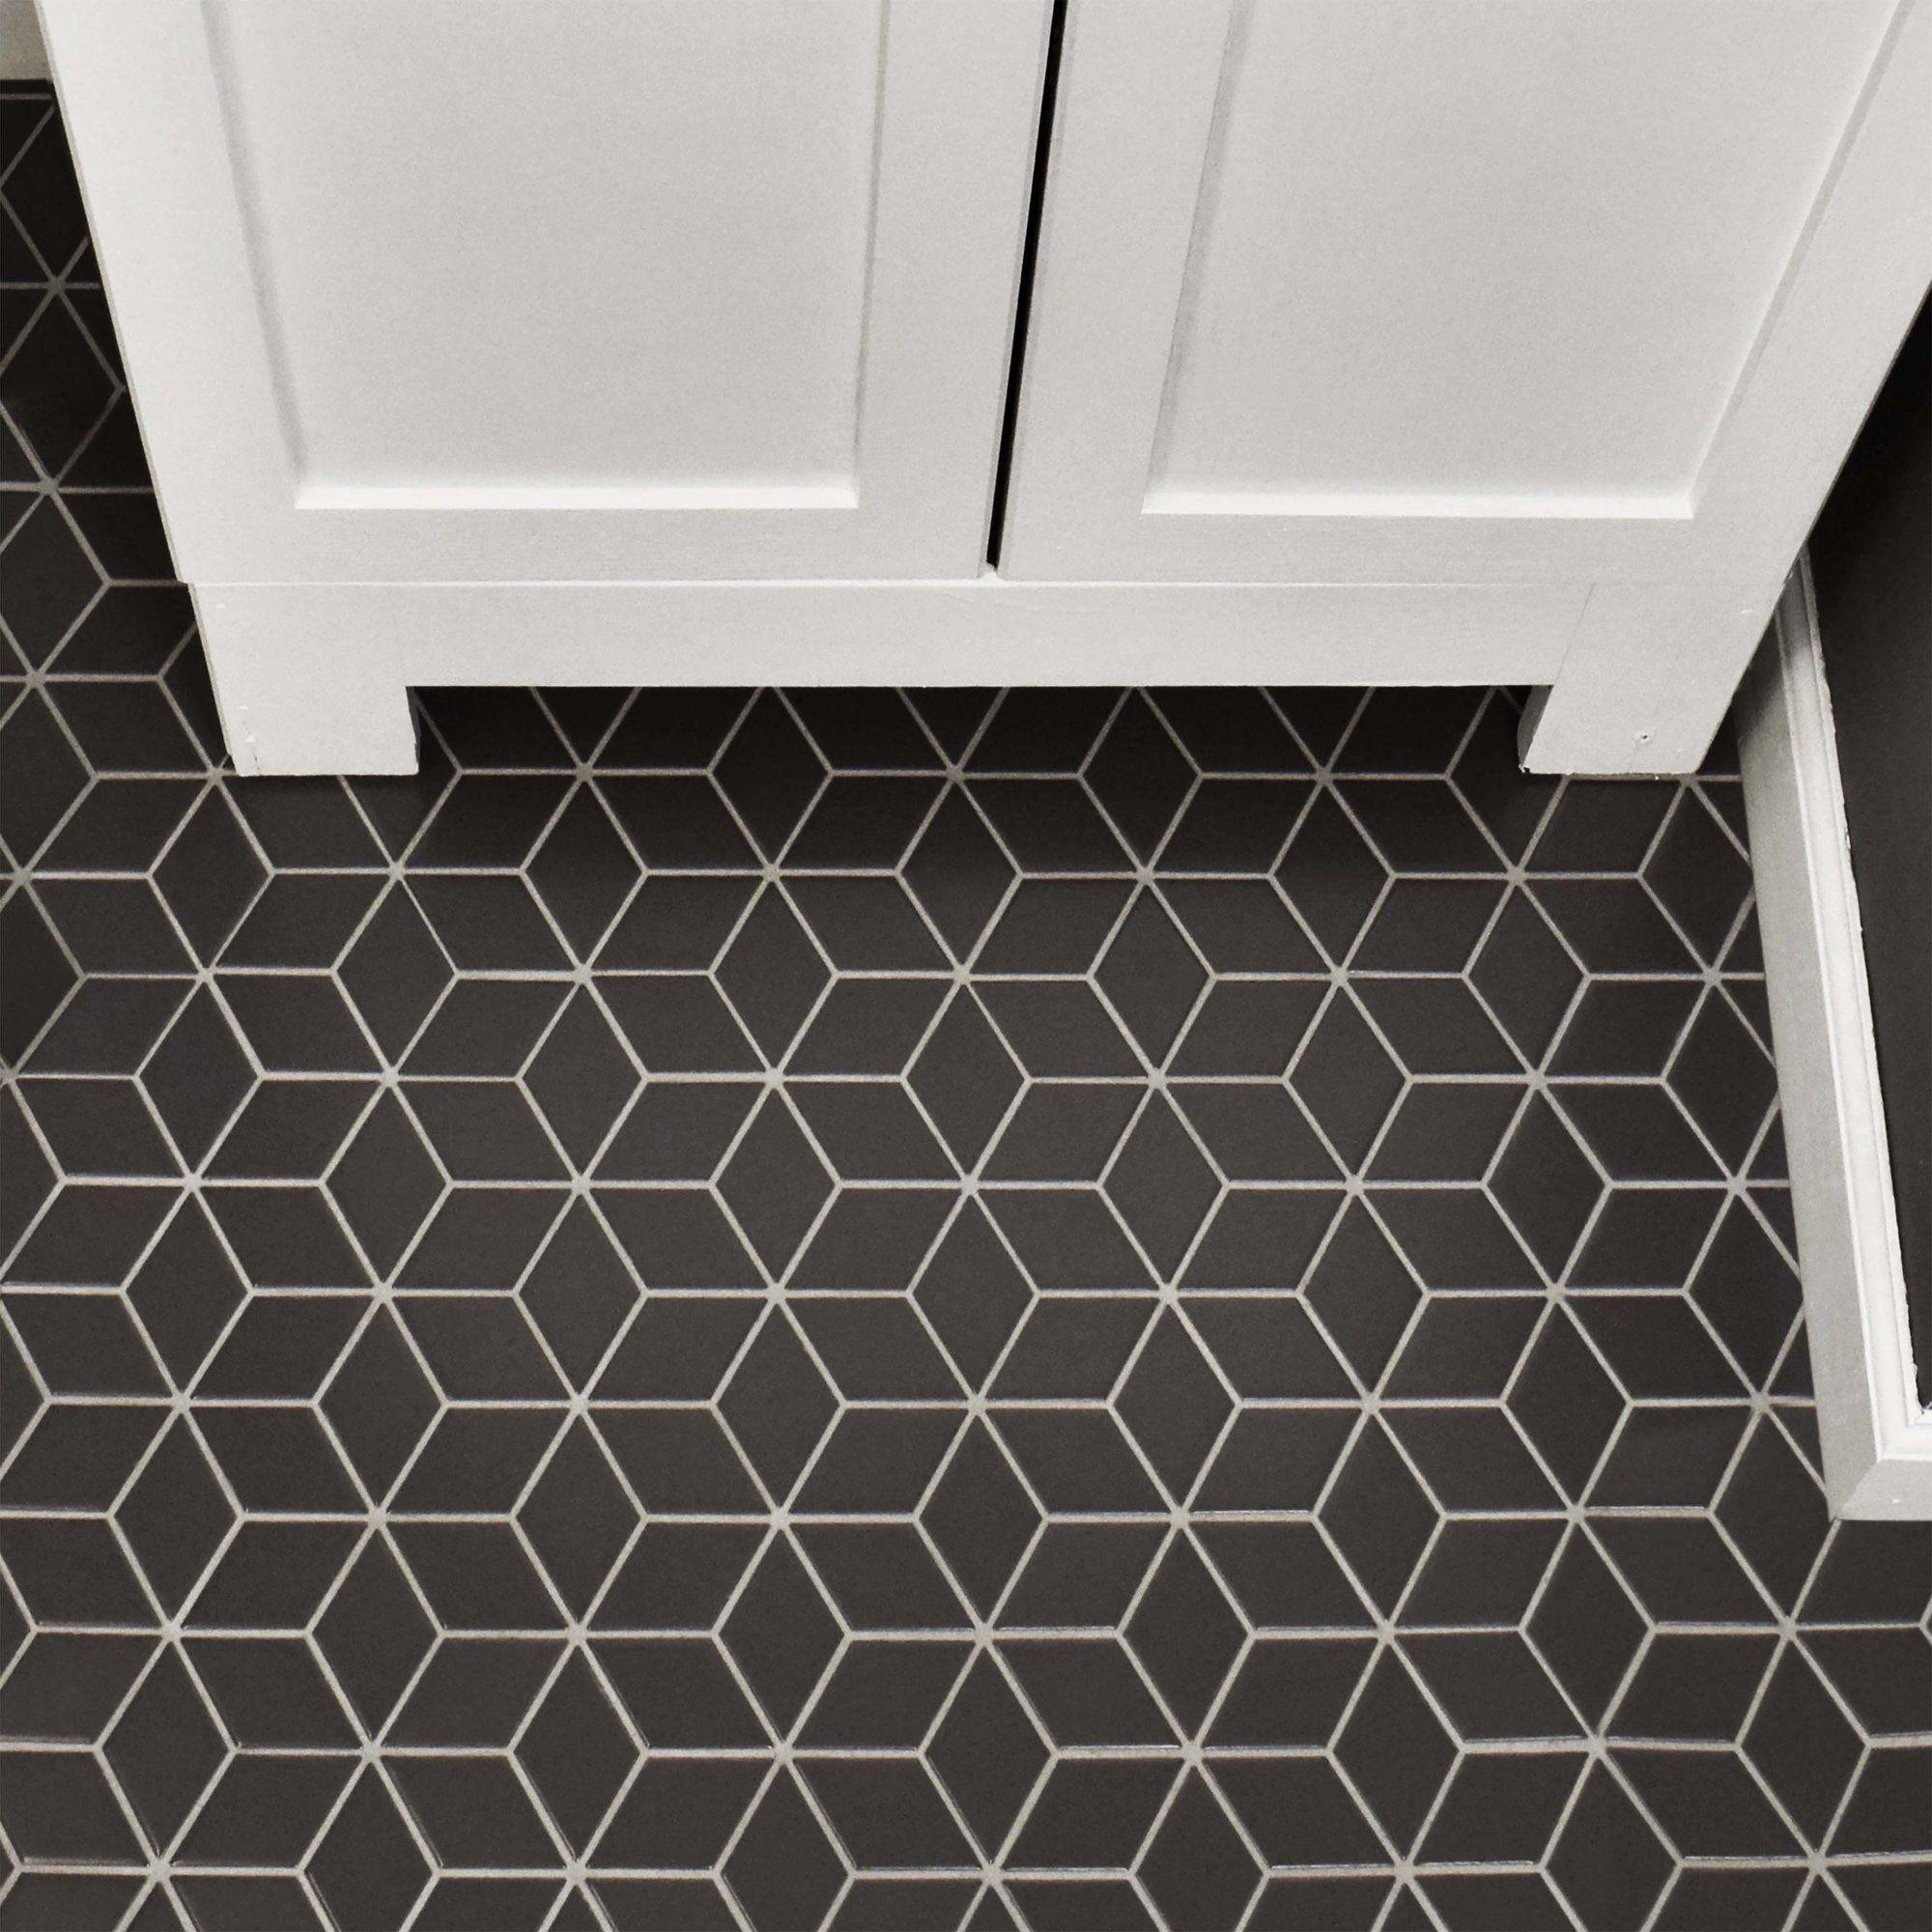 Retro Rhombus 2 X 3 Porcelain Mosaic Tile Tegels Vloeren Retro